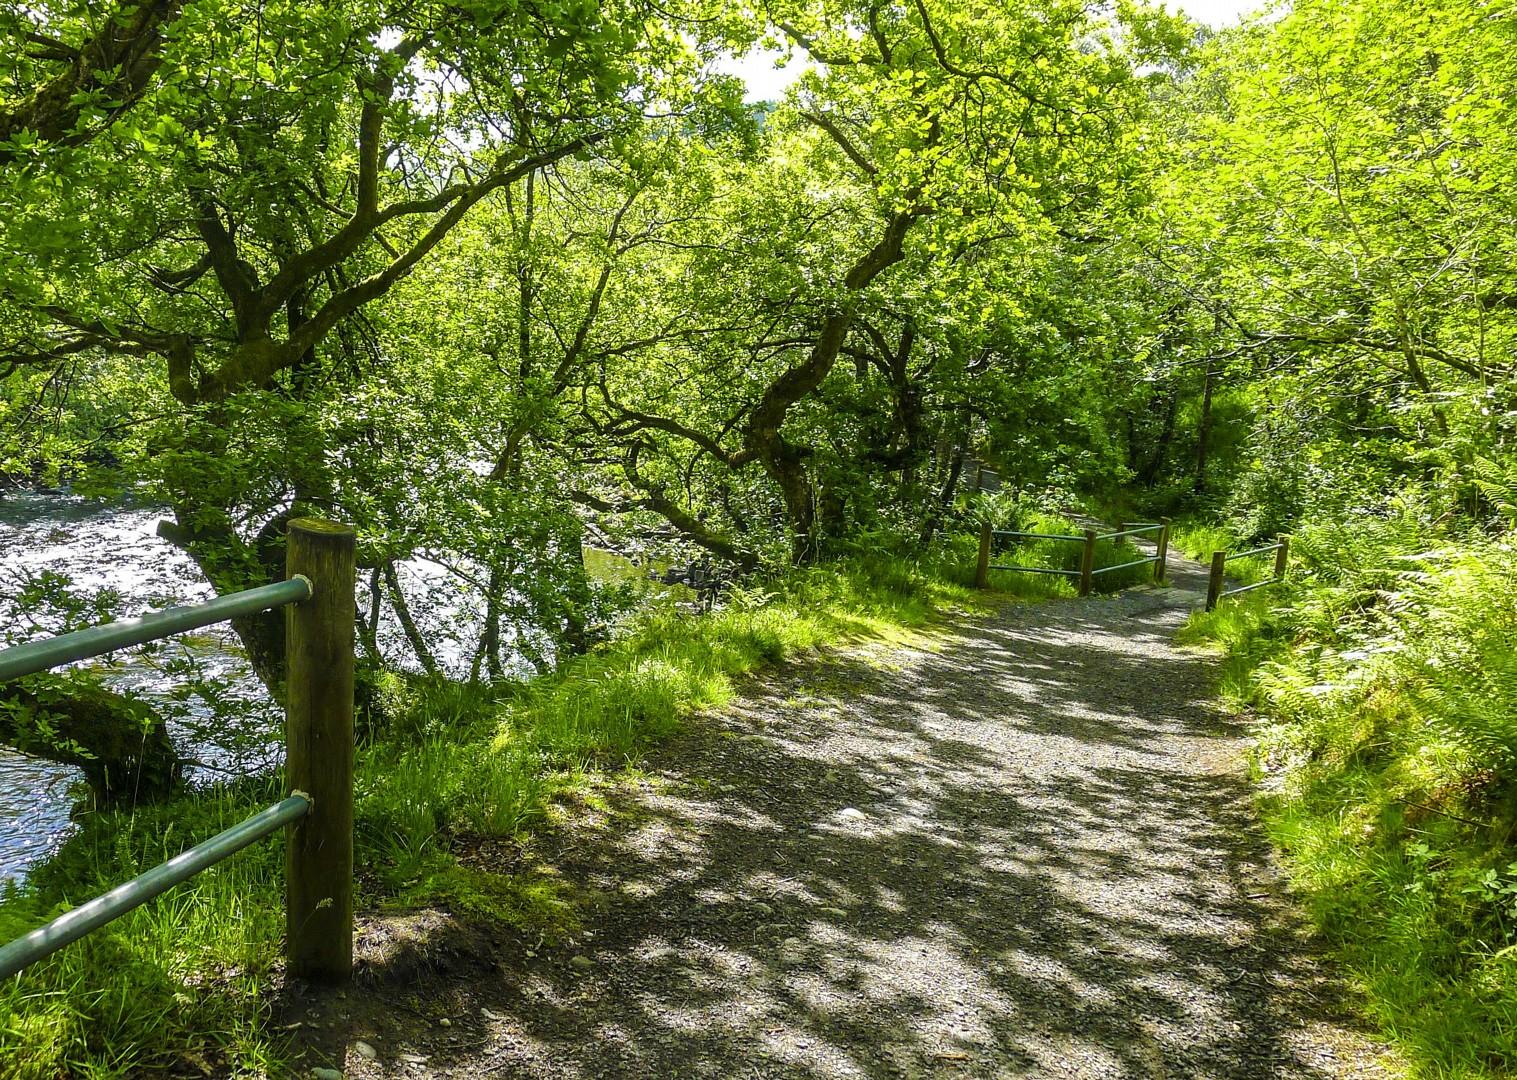 sustrans-traffic-free-cycle-paths-holiday-scotland-uk-skedaddle.jpg - UK - Scotland - Lochs and Glens - Leisure Cycling